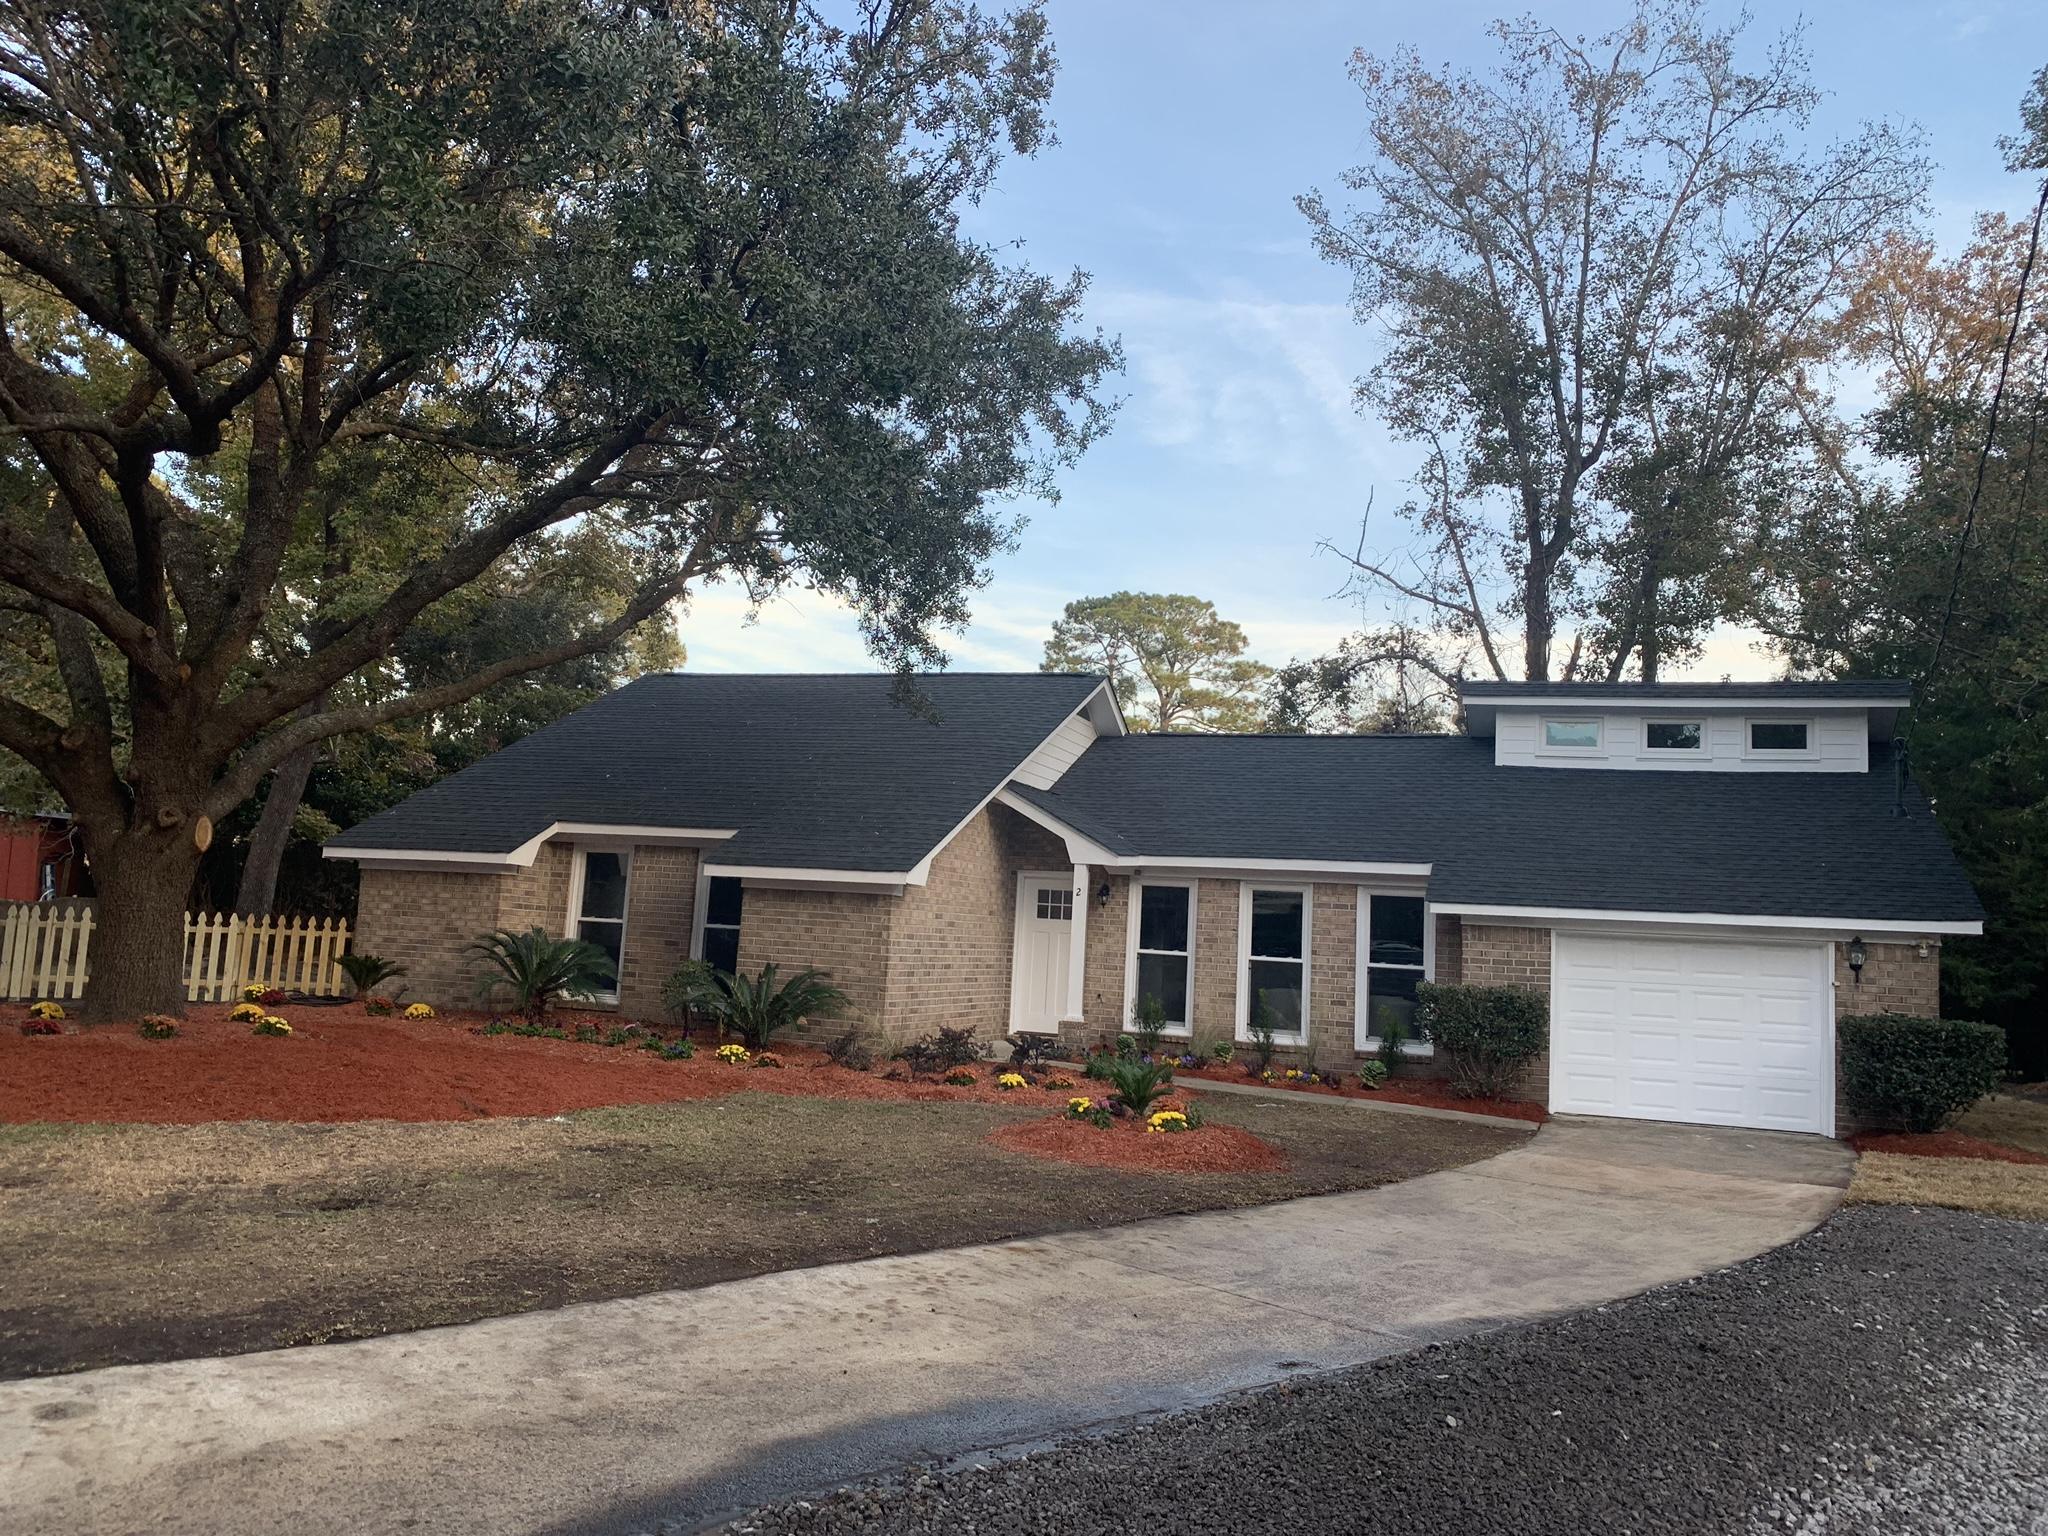 Heathwood Ext Homes For Sale - 2 Blaine, Charleston, SC - 15